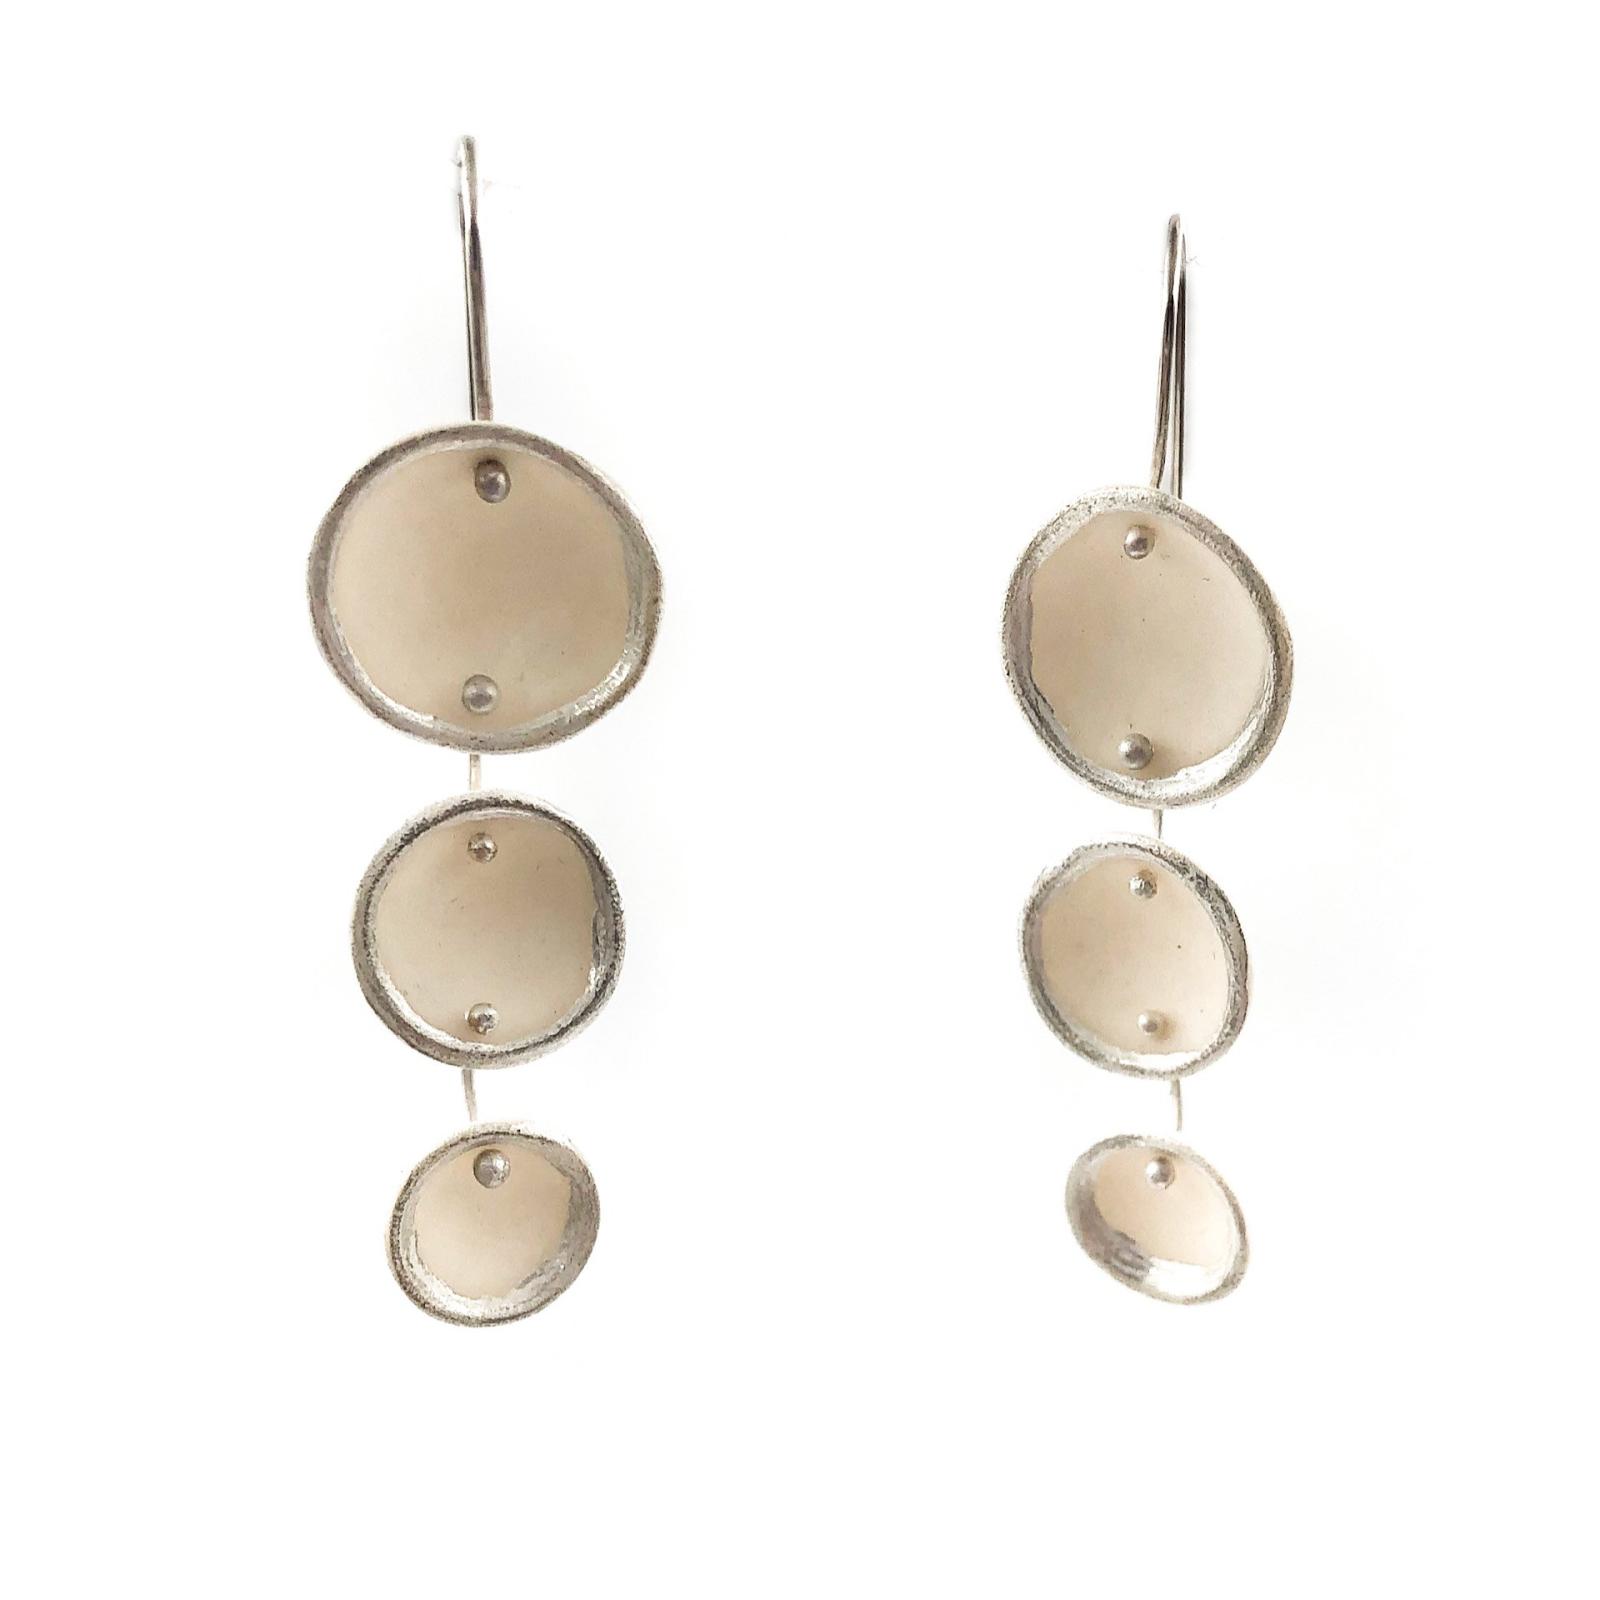 Gorgeous Circular Earrings